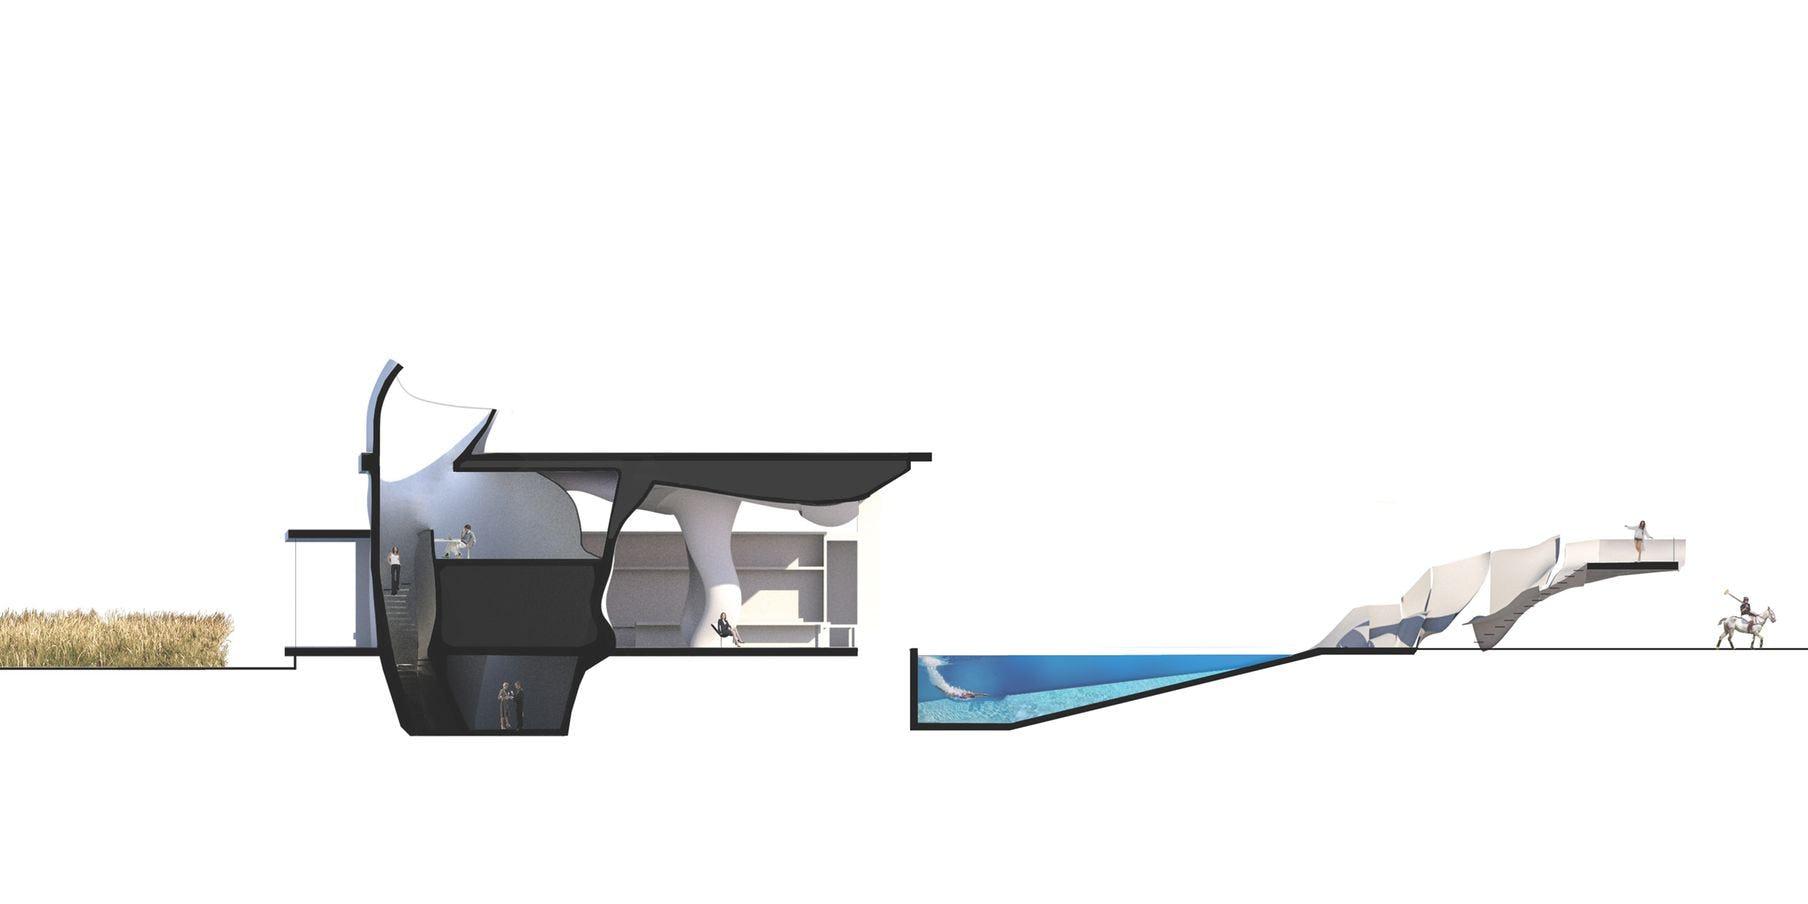 Rvtr pampas house 03